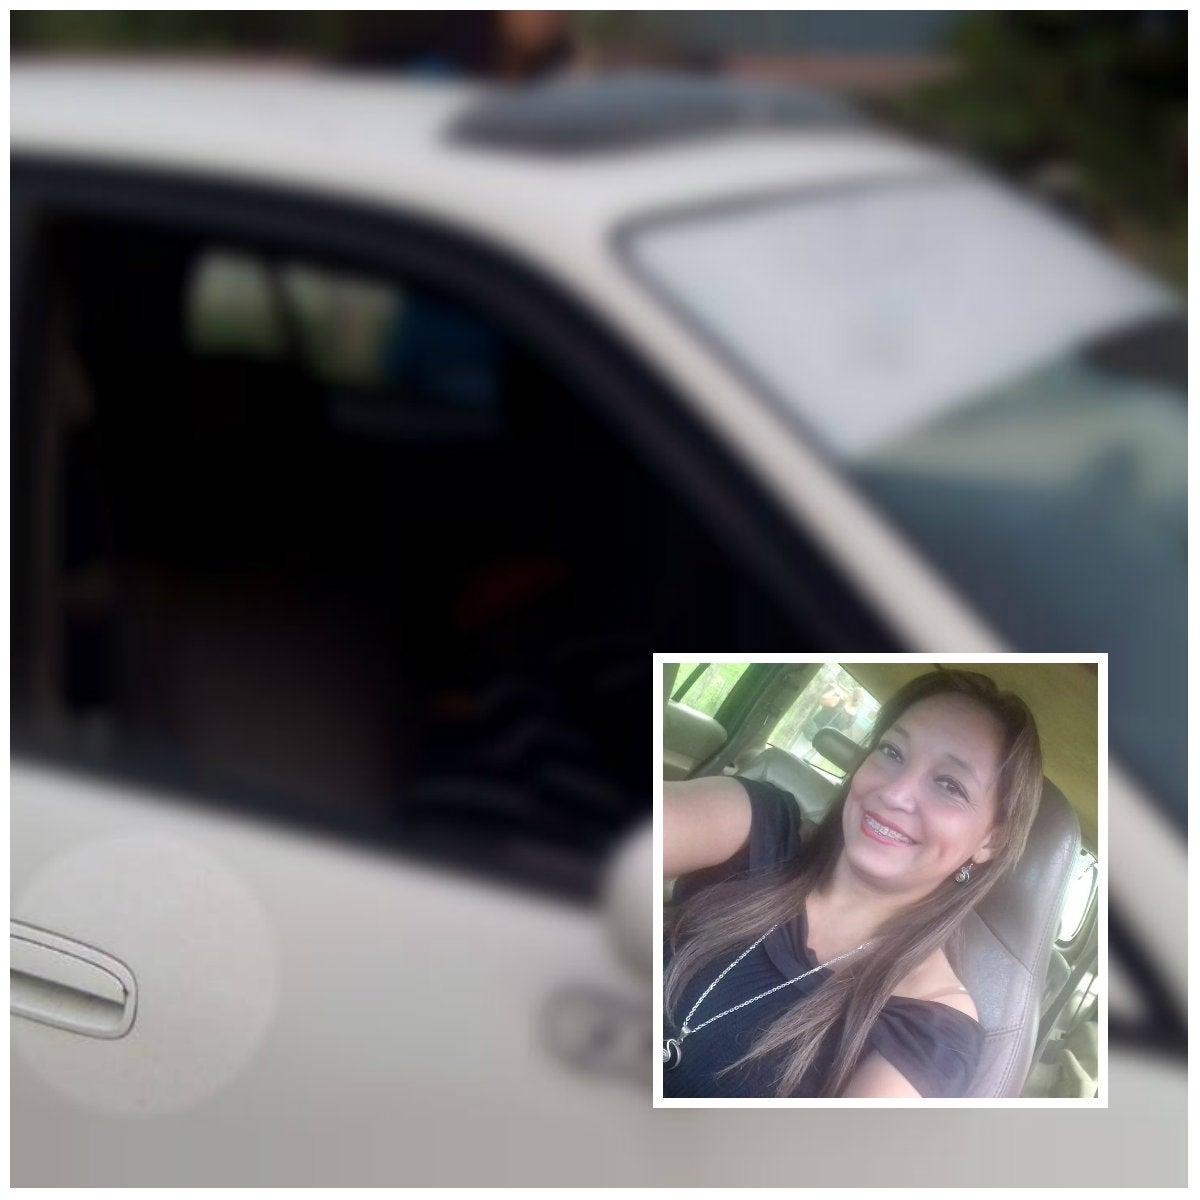 Asesinan a maestra en el interior de un taxi en Jucutuma